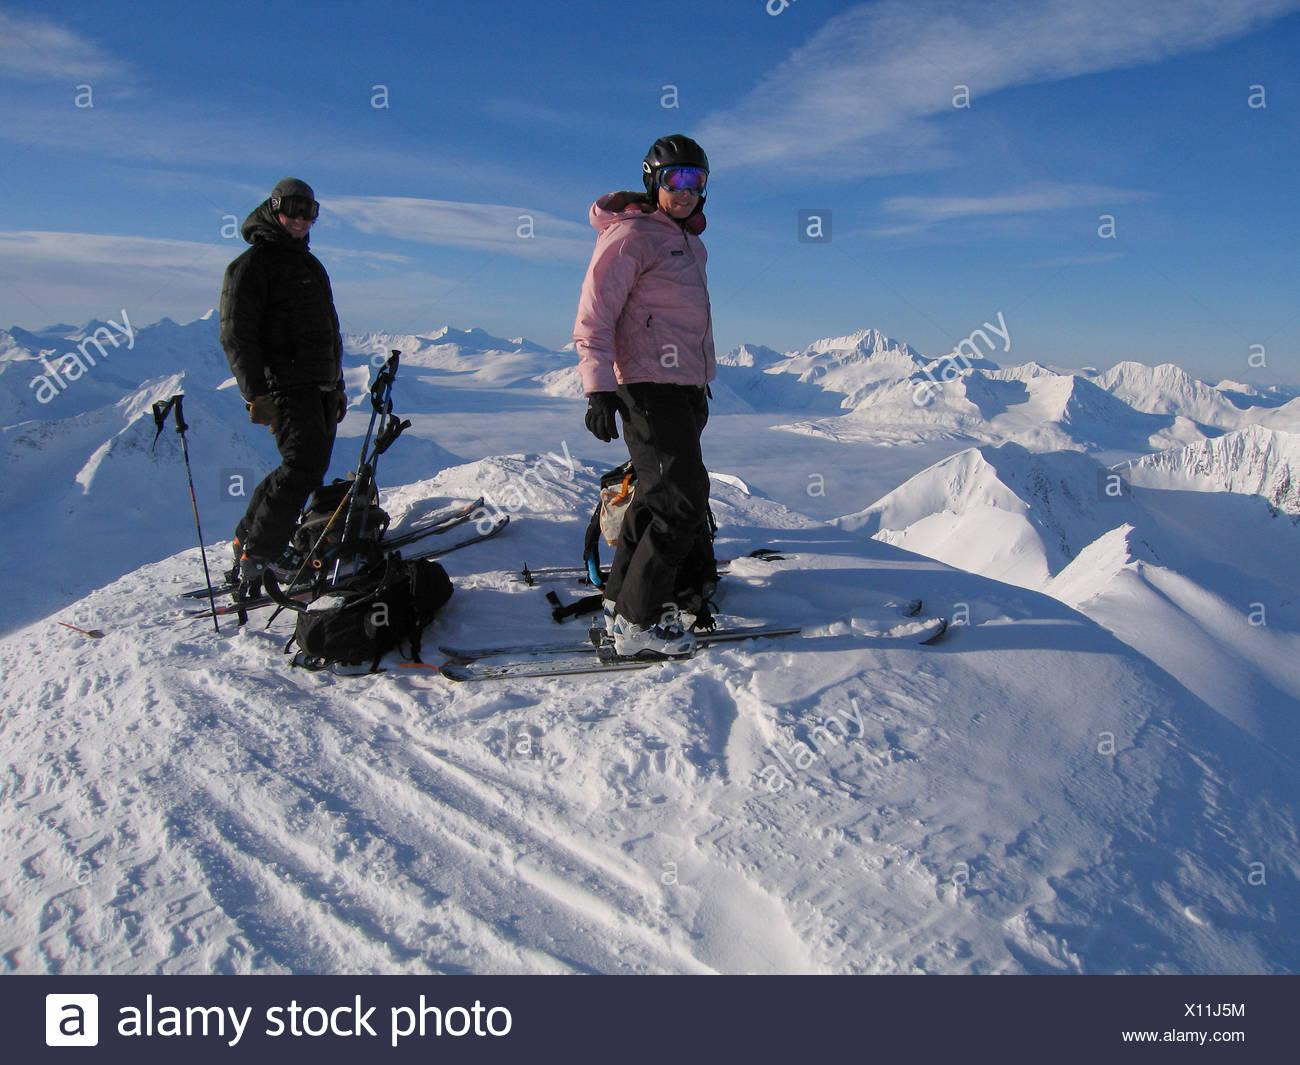 Backcountry skiers on top of a peak on Turnagain Pass, Alaska - Stock Image